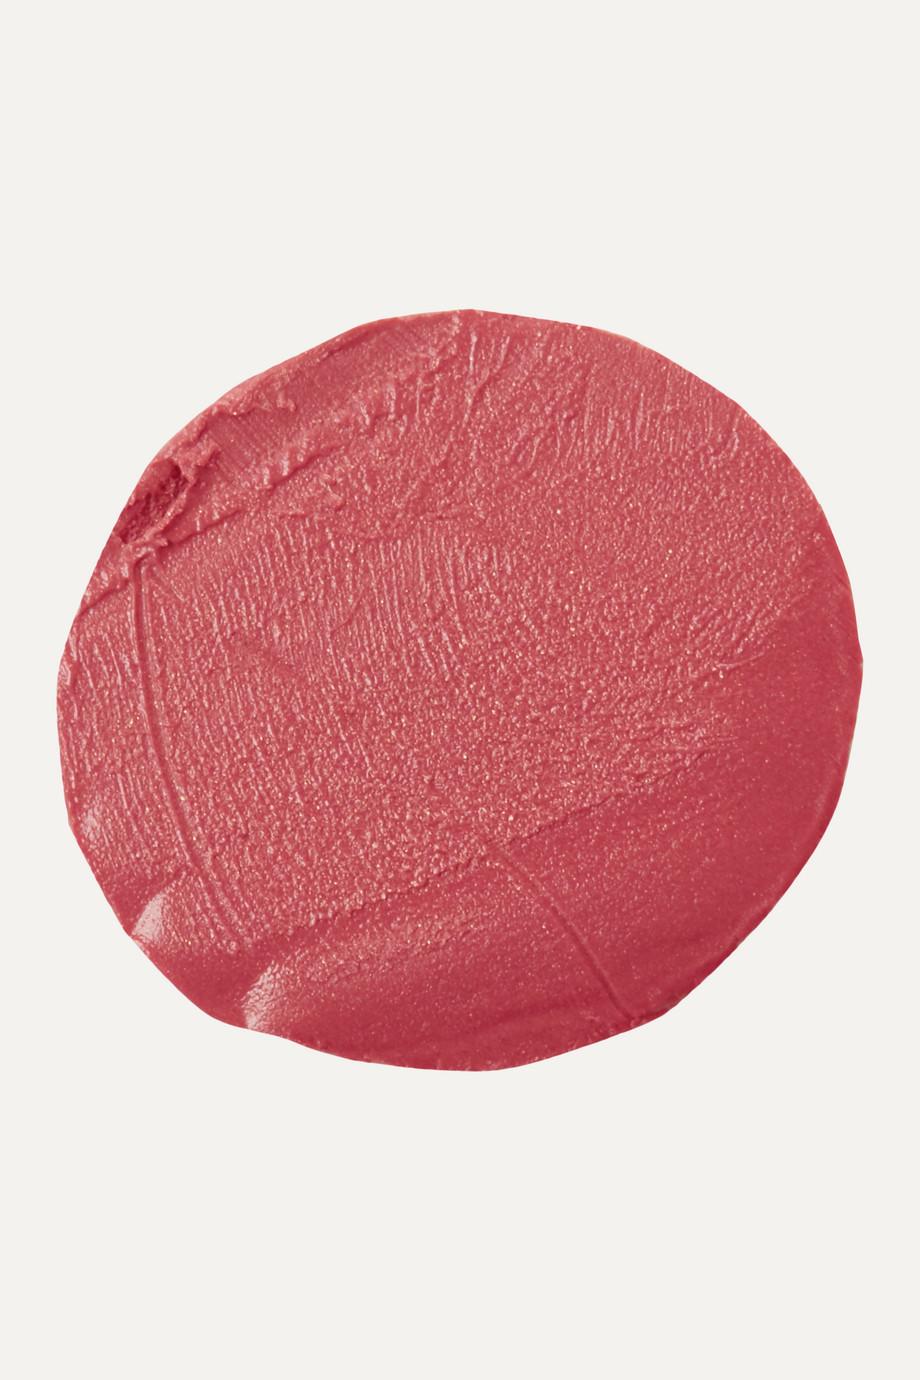 Code8 Color Brilliance Lipstick - Cappadocia